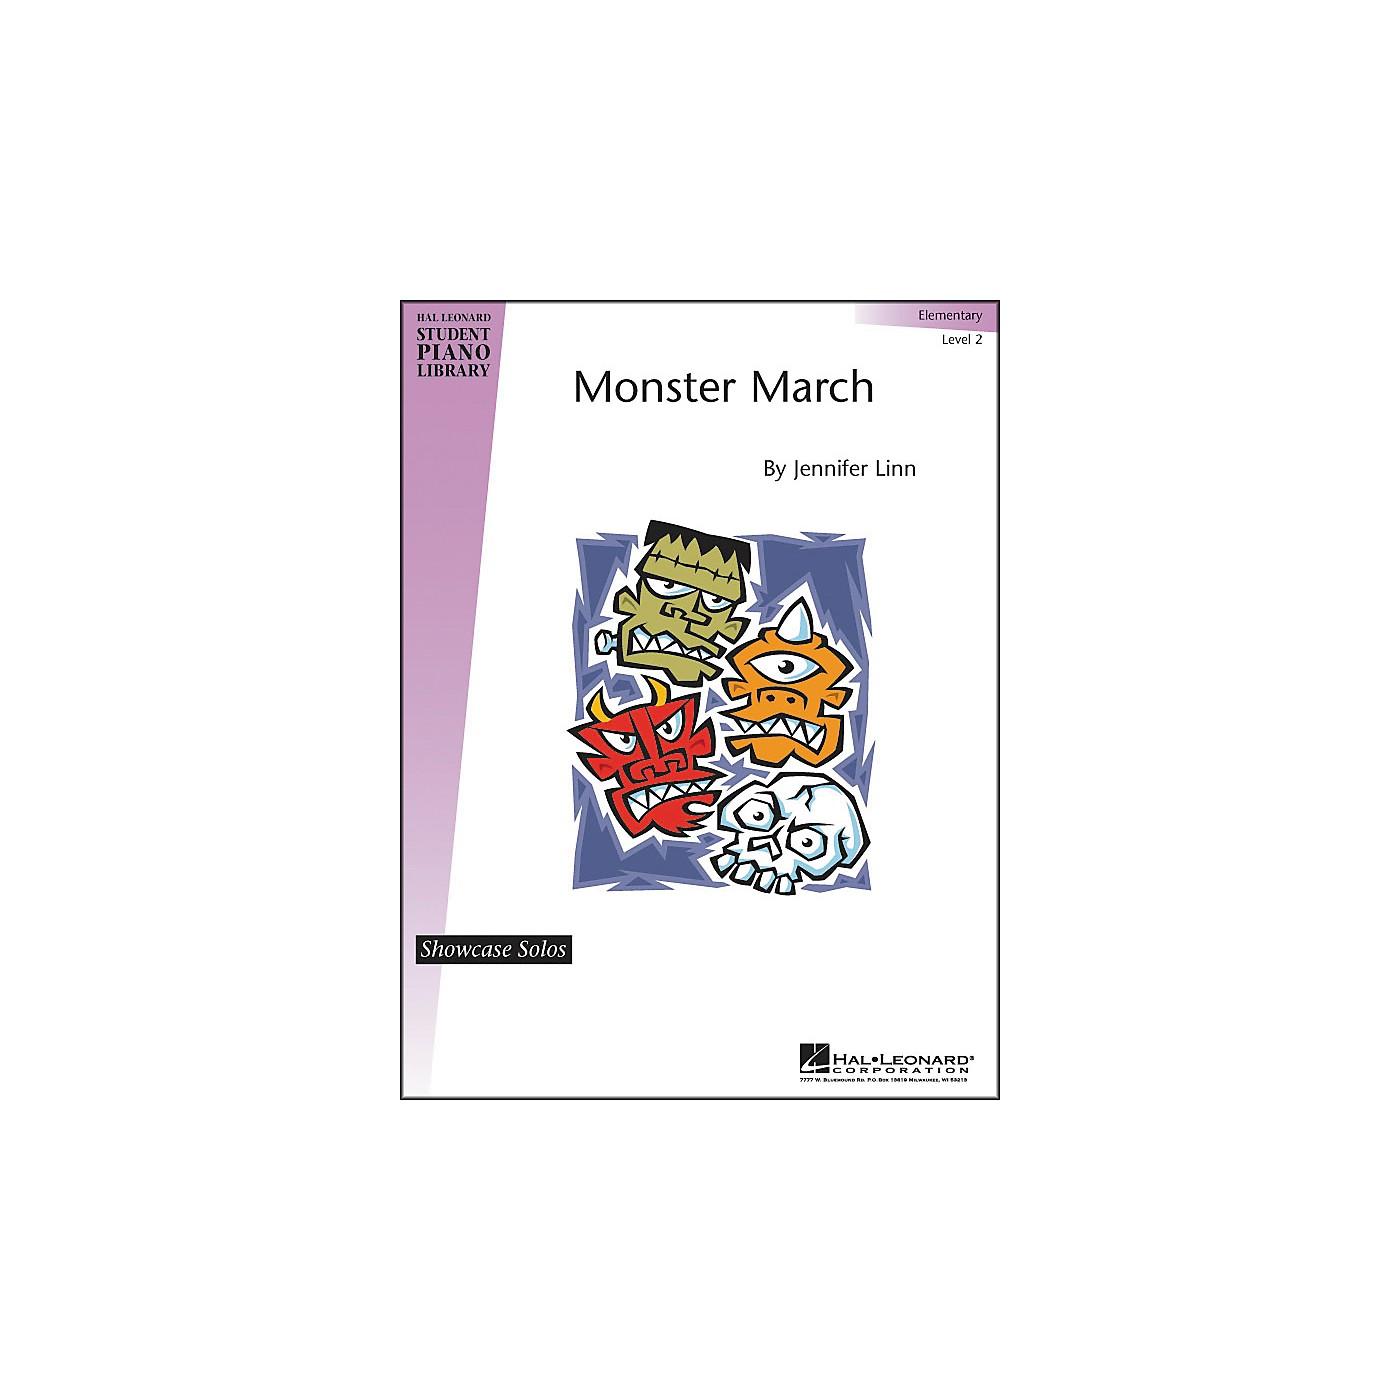 Hal Leonard Monster March Elementary Level 2 Showcase Solos Hal Leonard Student Piano Library thumbnail